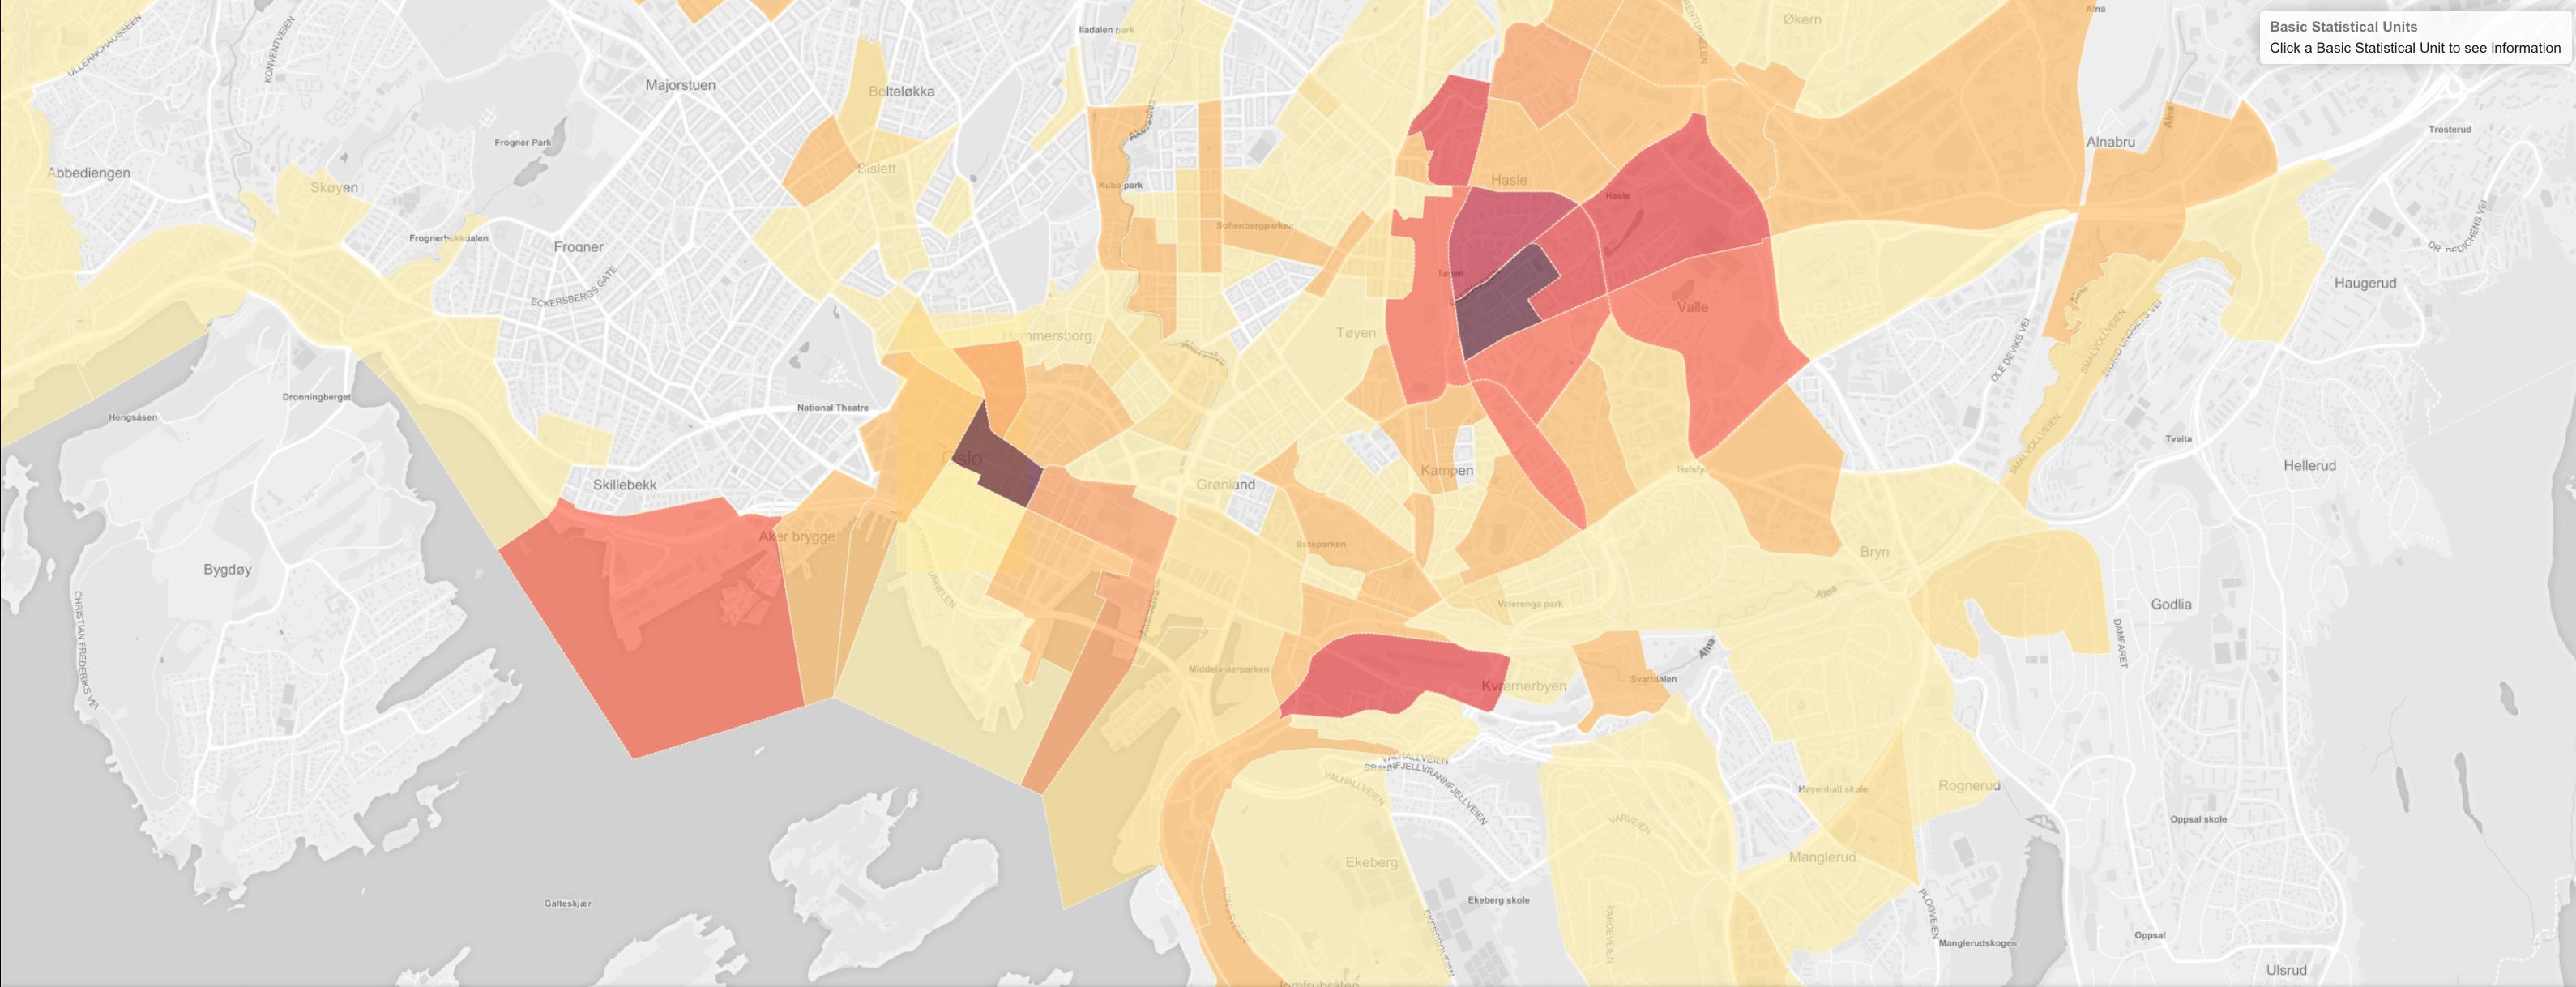 Heat-map showing density in part of Oslo.